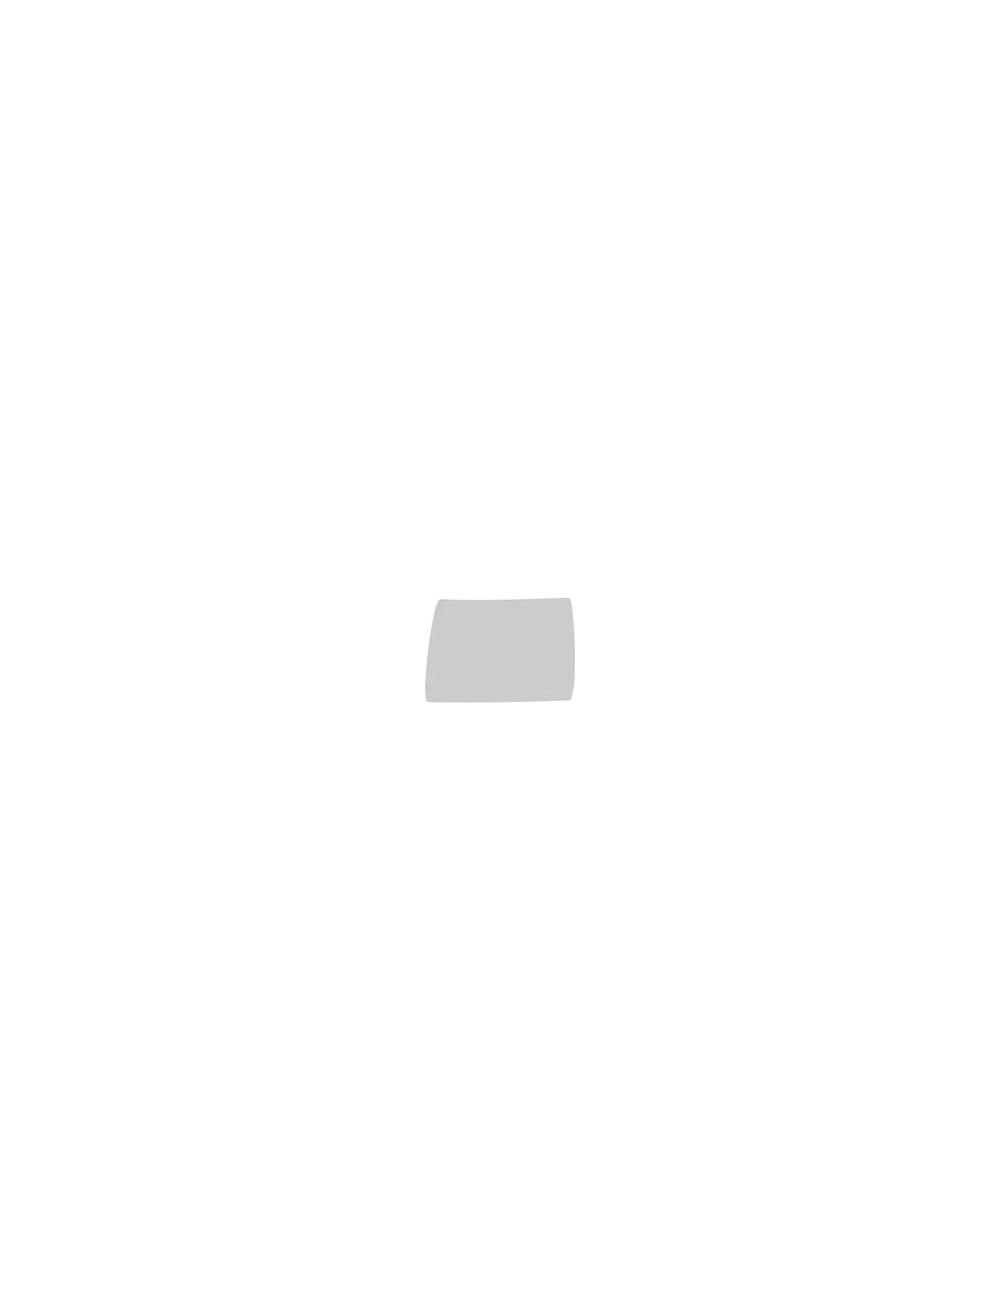 Litepanels - Gel Opal Frost Diffusion para Astra 1x1